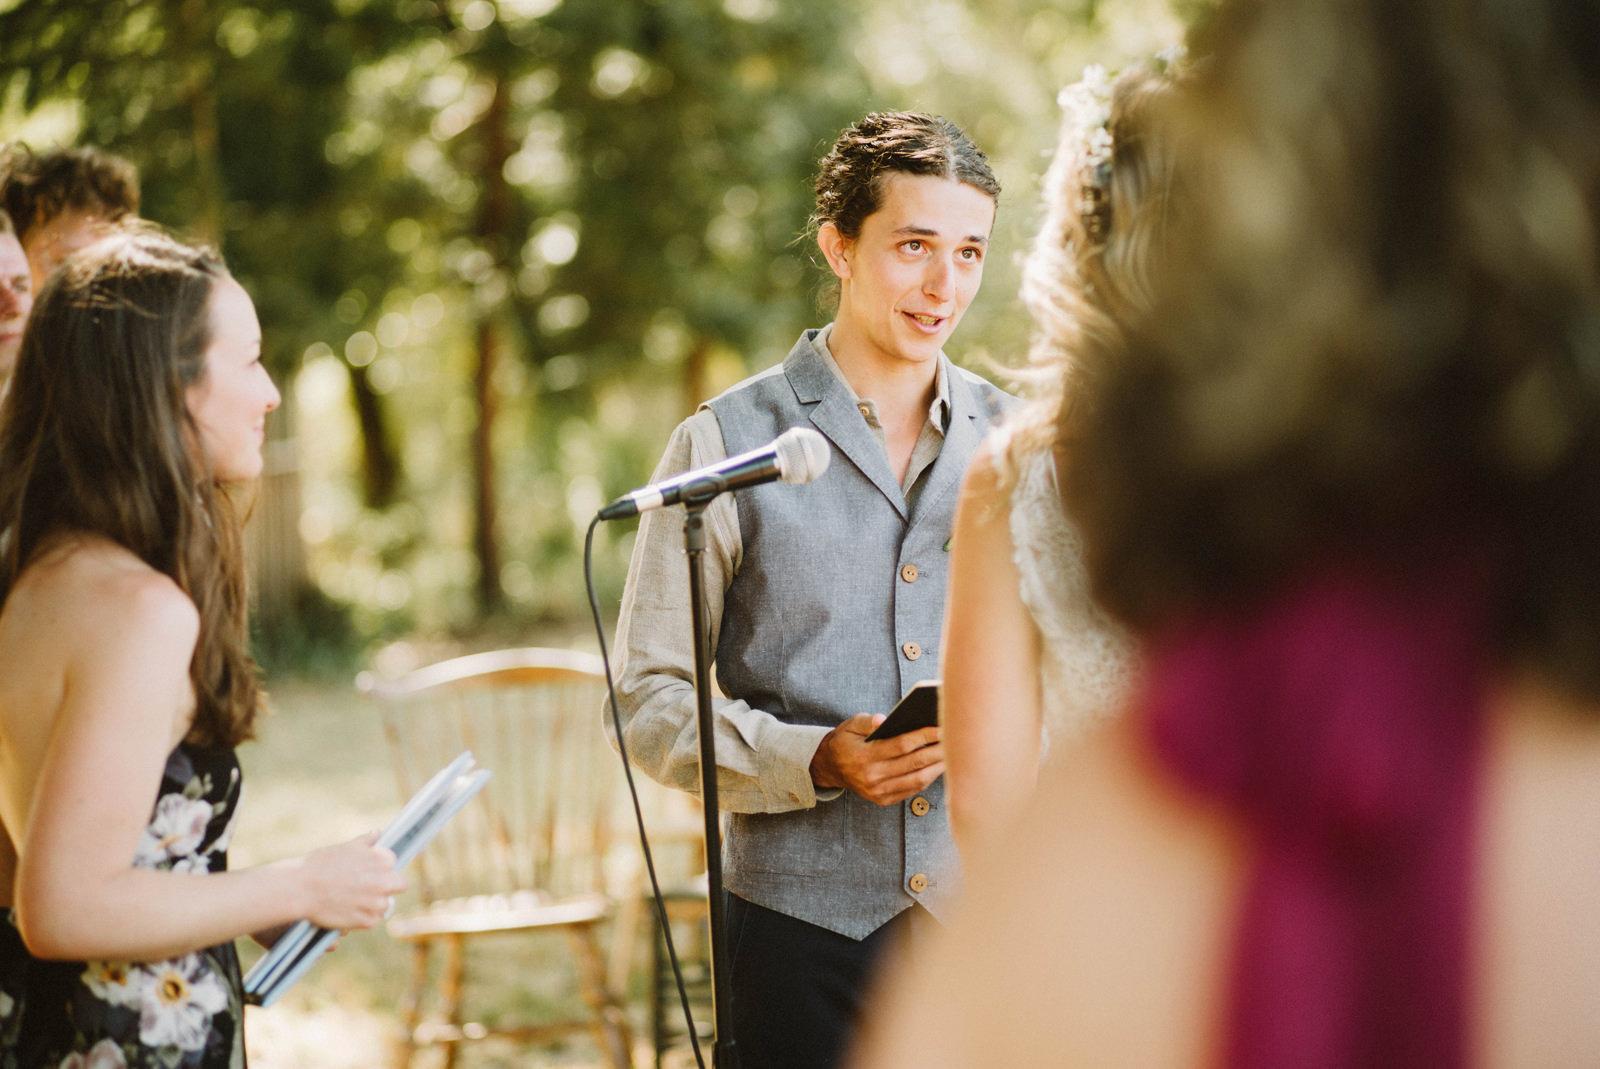 rivers-bend-retreat-wedding-031 RIVER'S BEND RETREAT WEDDING